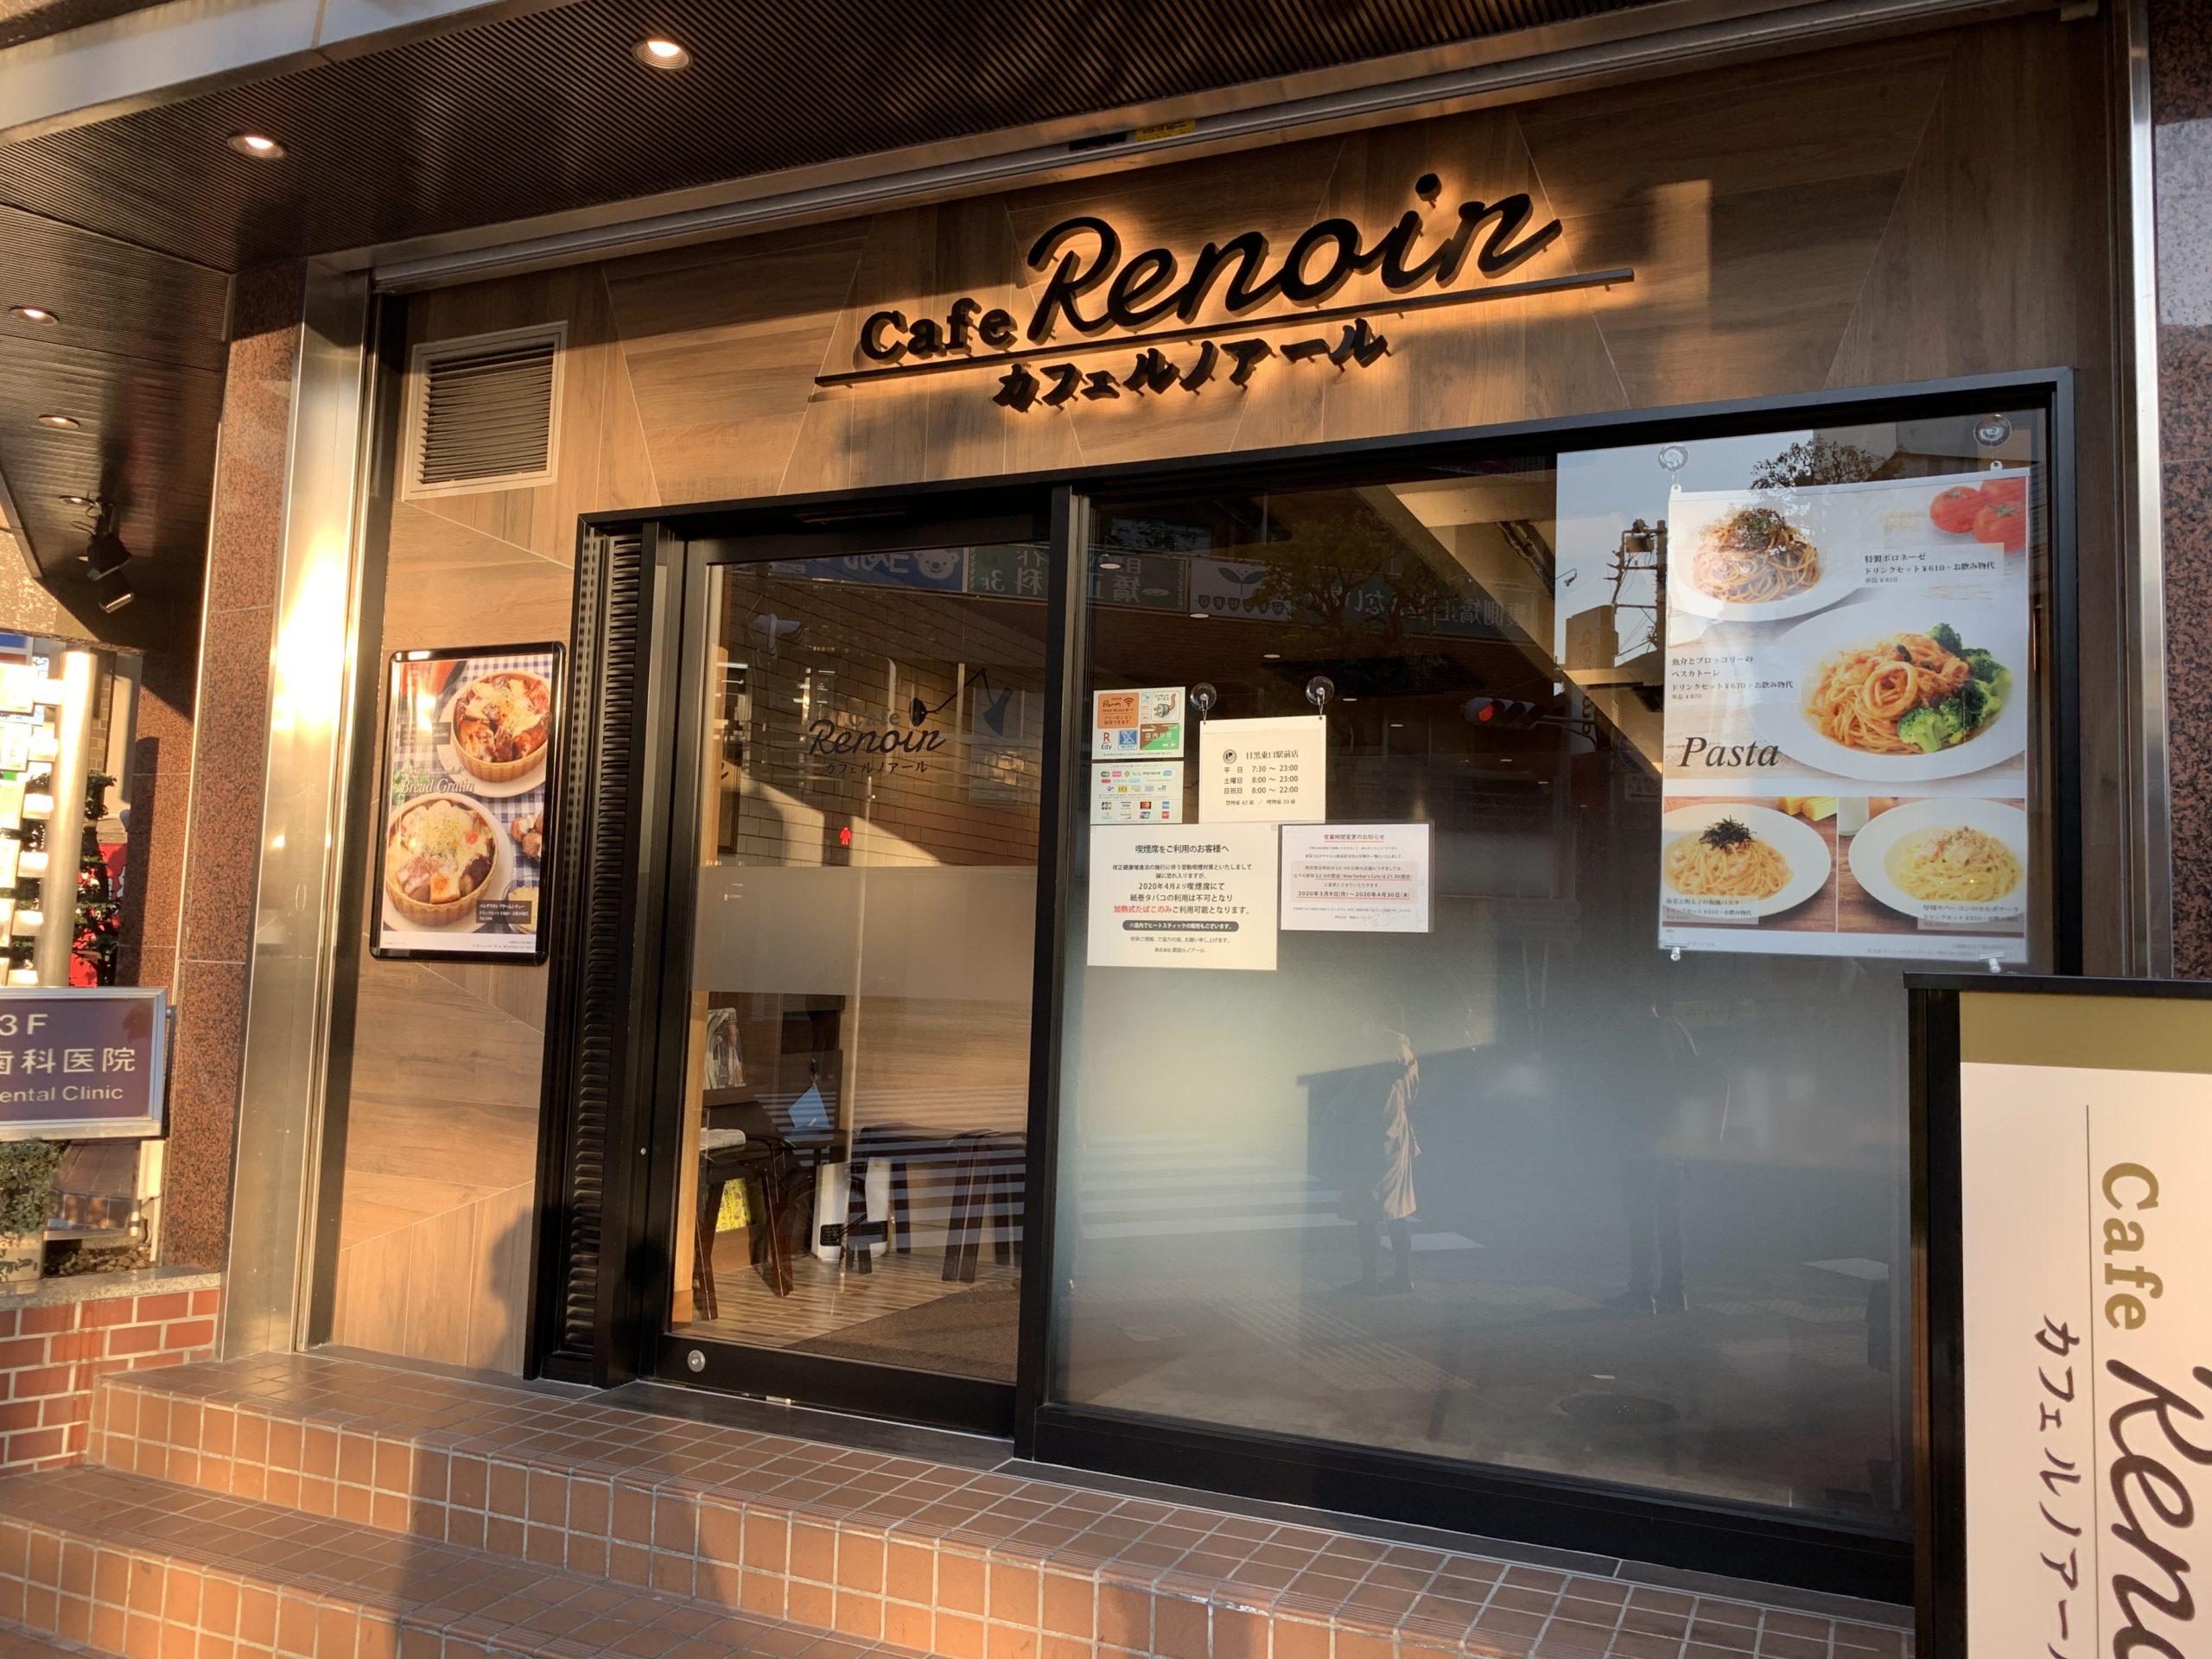 目黒駅東口 電源カフェ Cafe Renoir 目黒東口駅前店 Wi-Fi